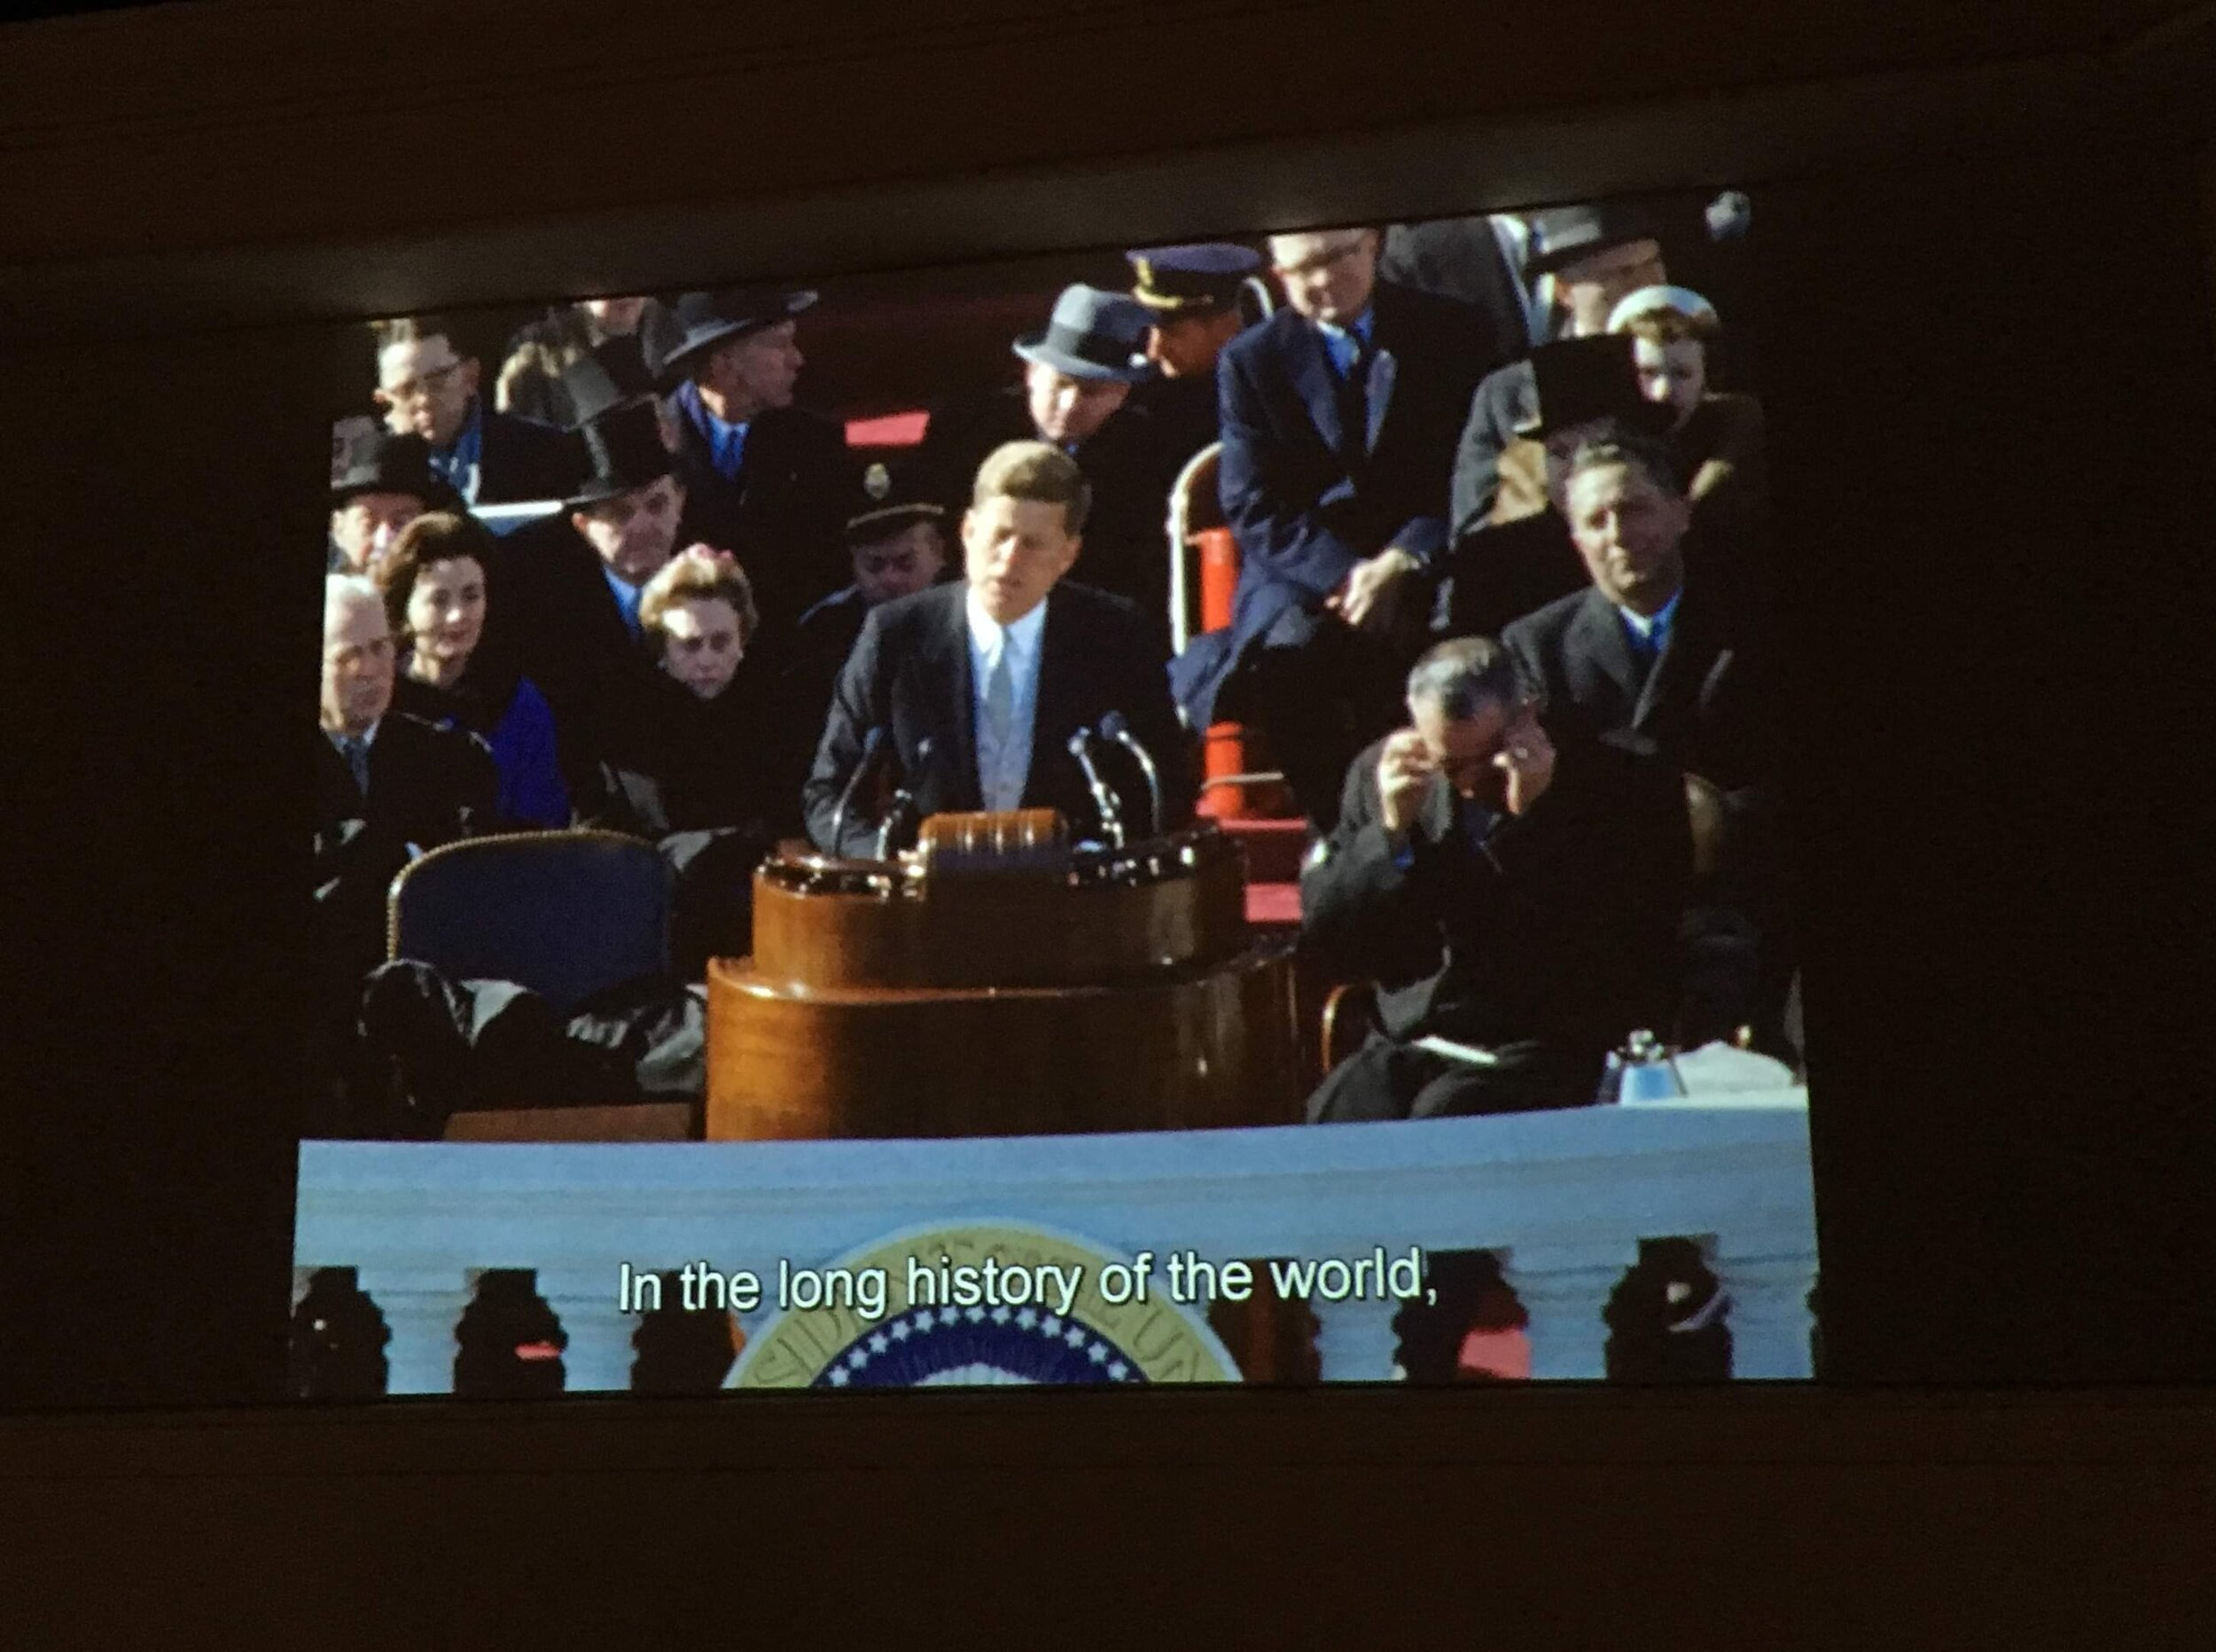 Kennedy inaugural address. I memorized it for high school forensics